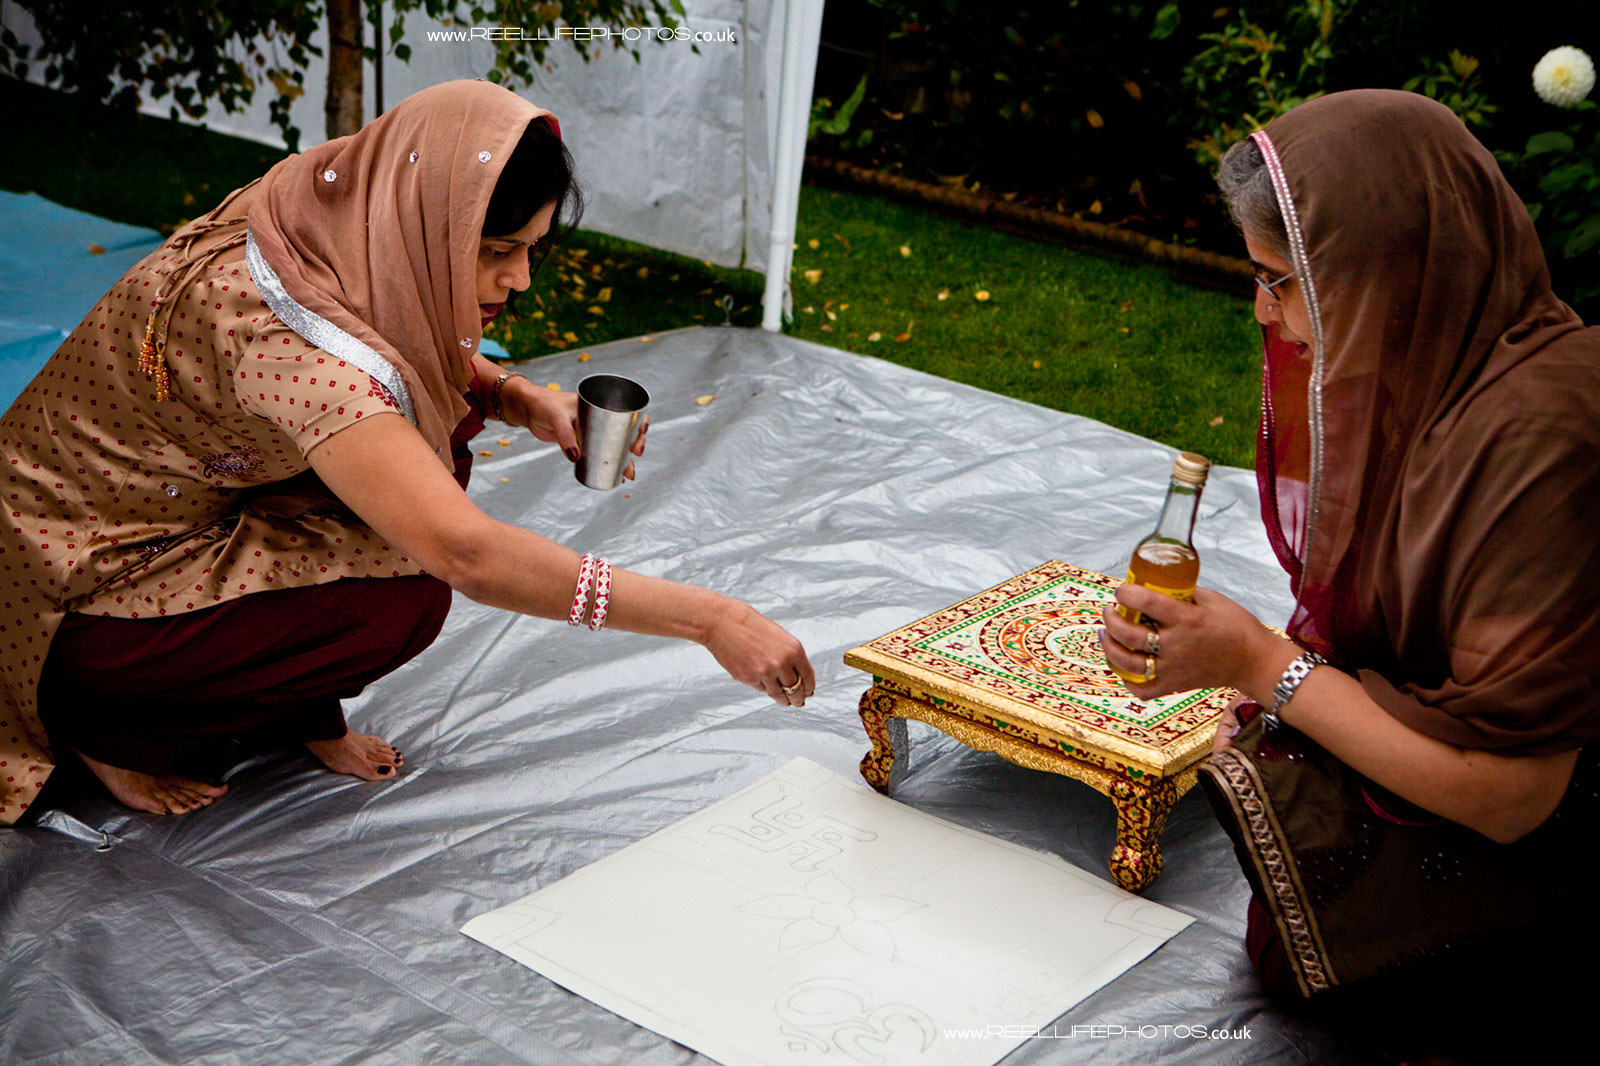 ReelLifePhotos Wedding Photography » Hindu wedding ceremony